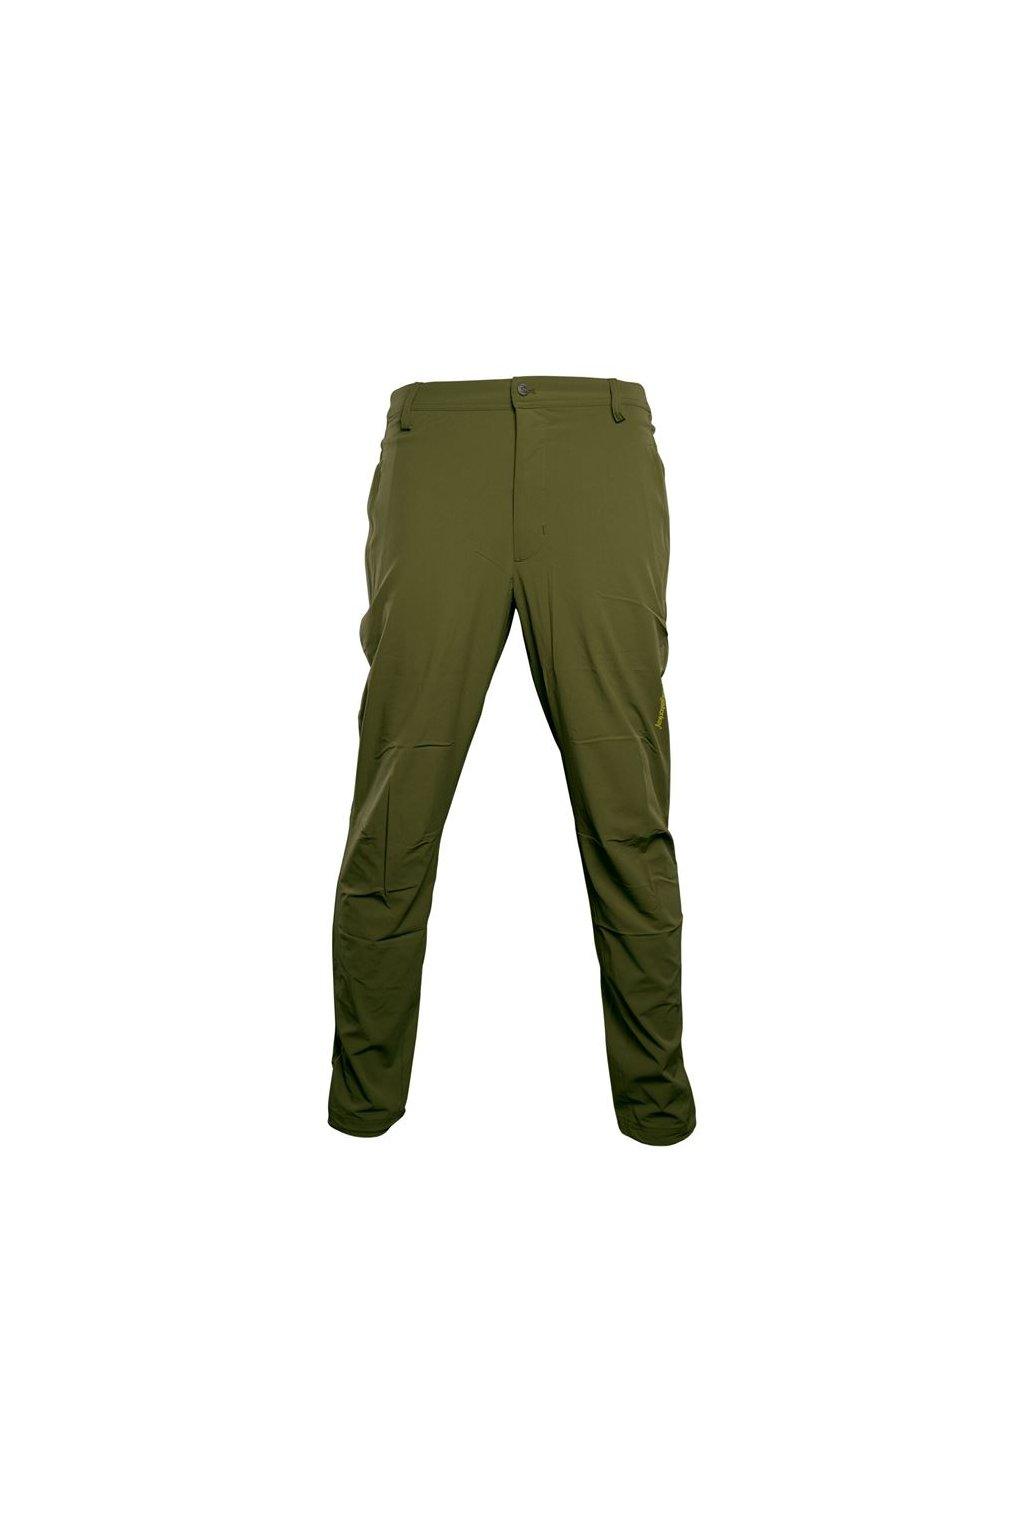 RidgeMonkey Kalhoty APEarel Dropback Lightweight Trousers Green